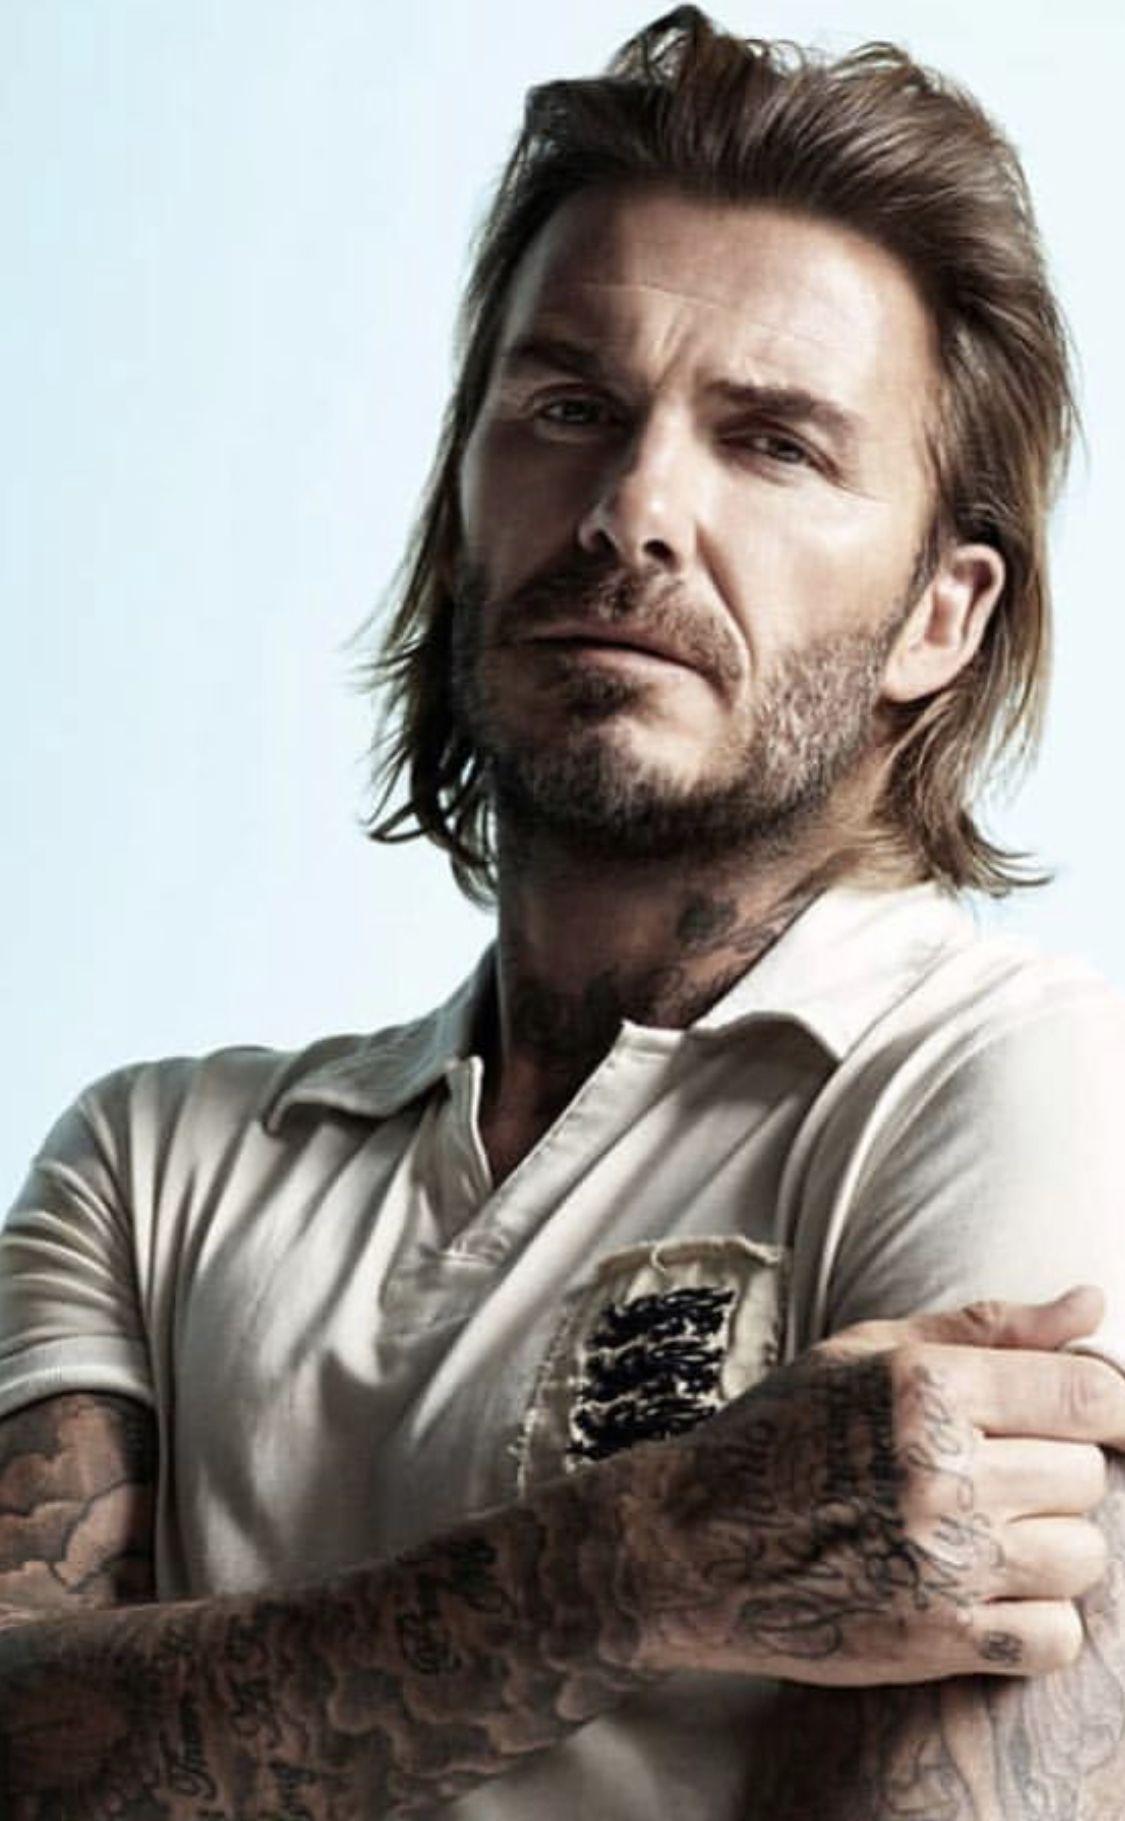 Pin By David Beckham On David Beckham David Beckham Long Hair David Beckham Hairstyle Beckham Hair